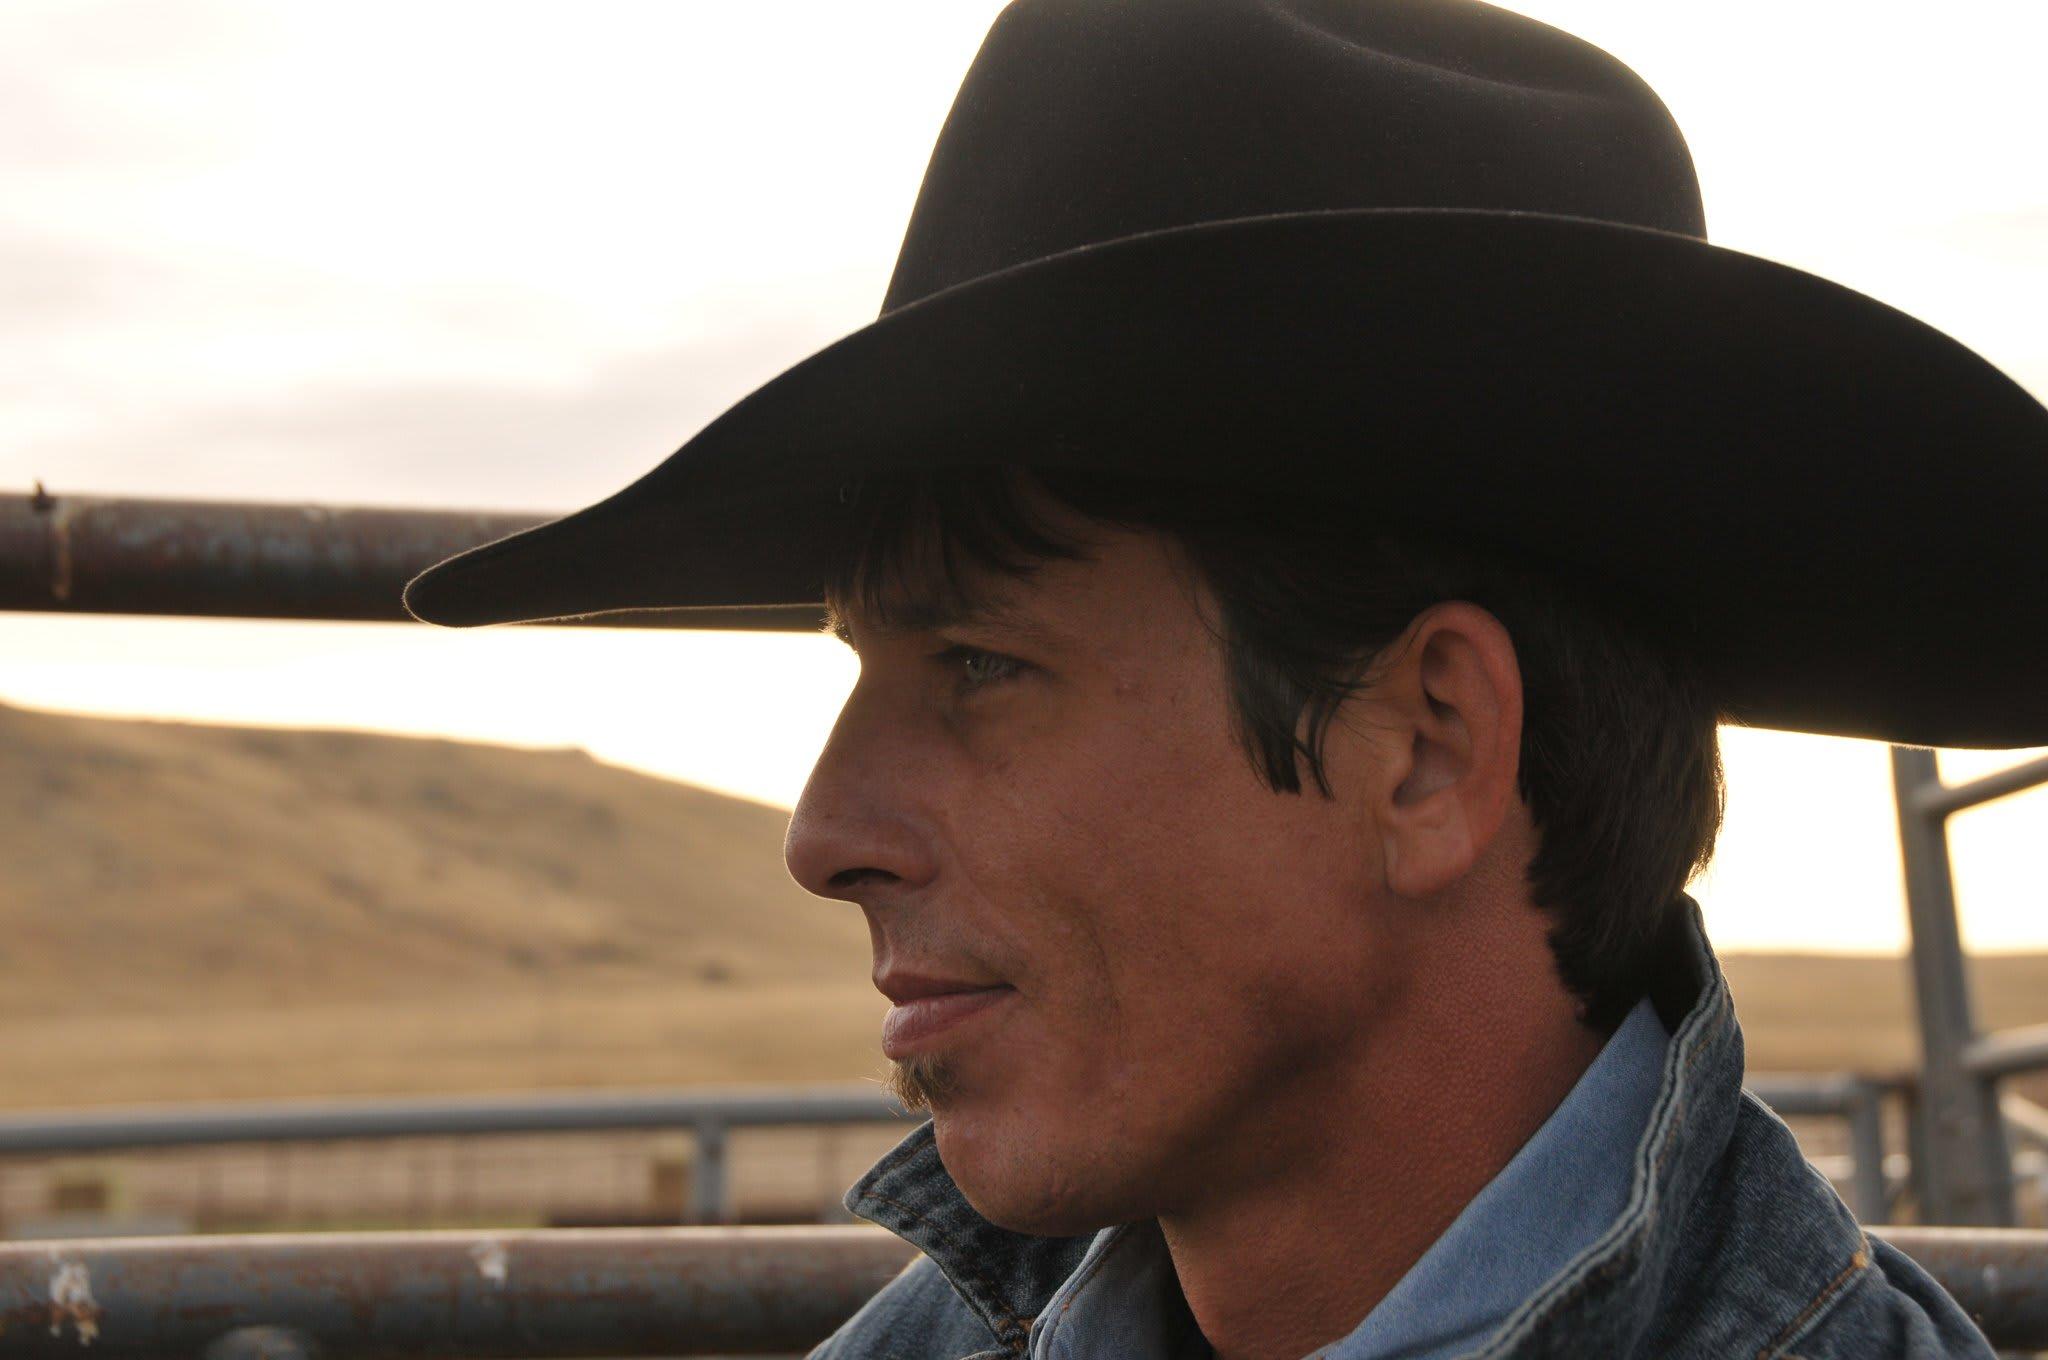 JB Mauney bull rider